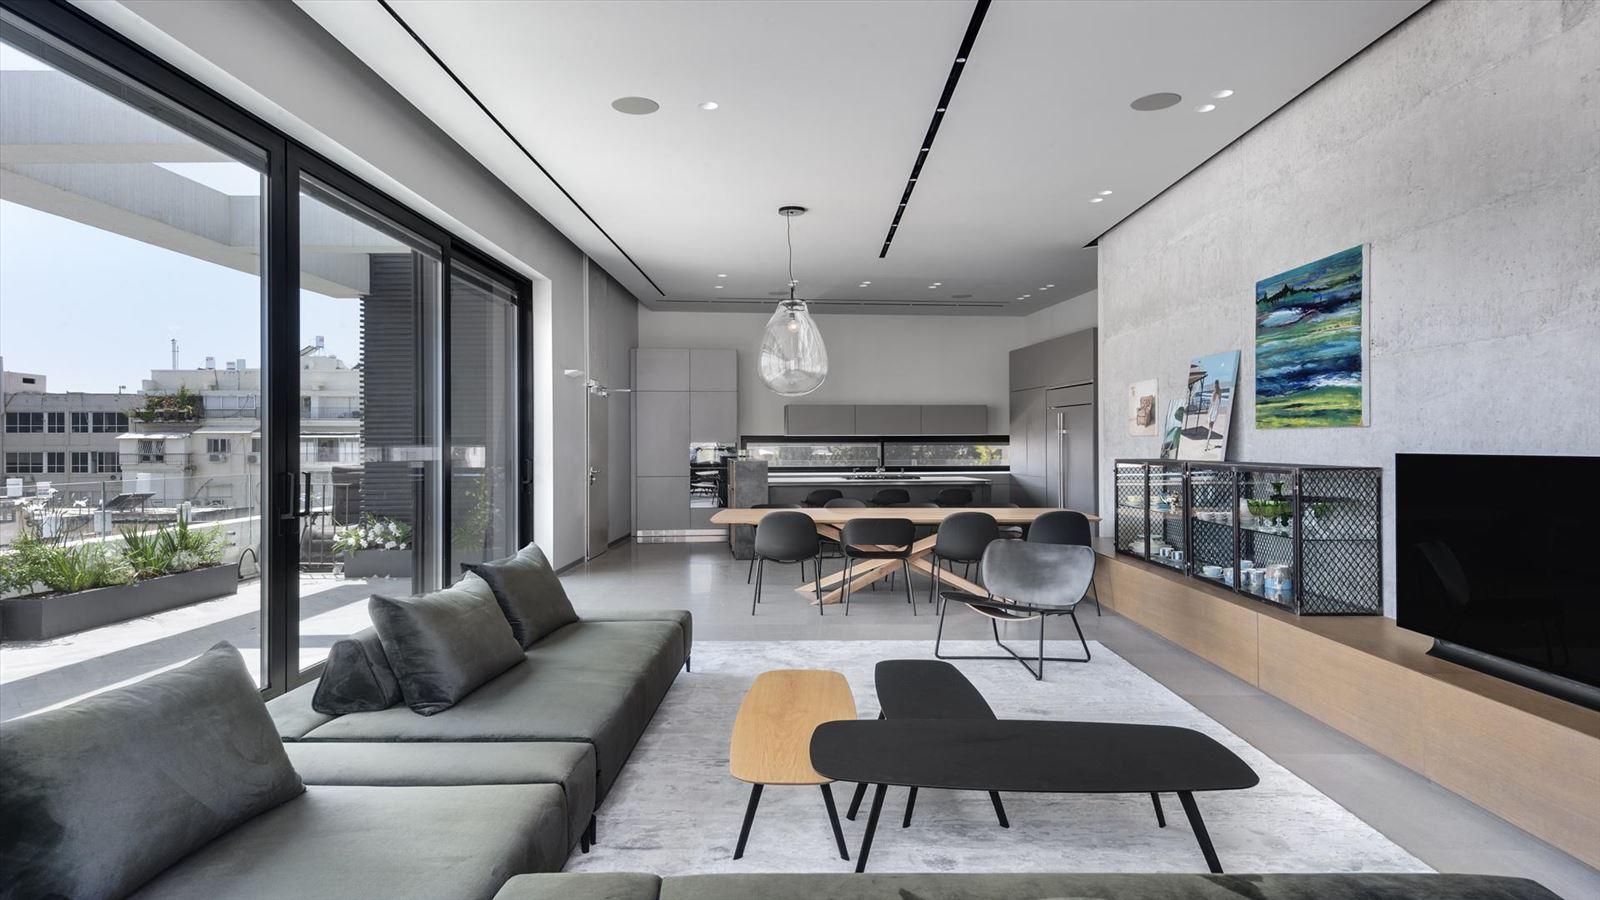 CENTRAL TLV LOFT לאורך כל מרחב הסלון גופי תאורה של קמחי תאורה